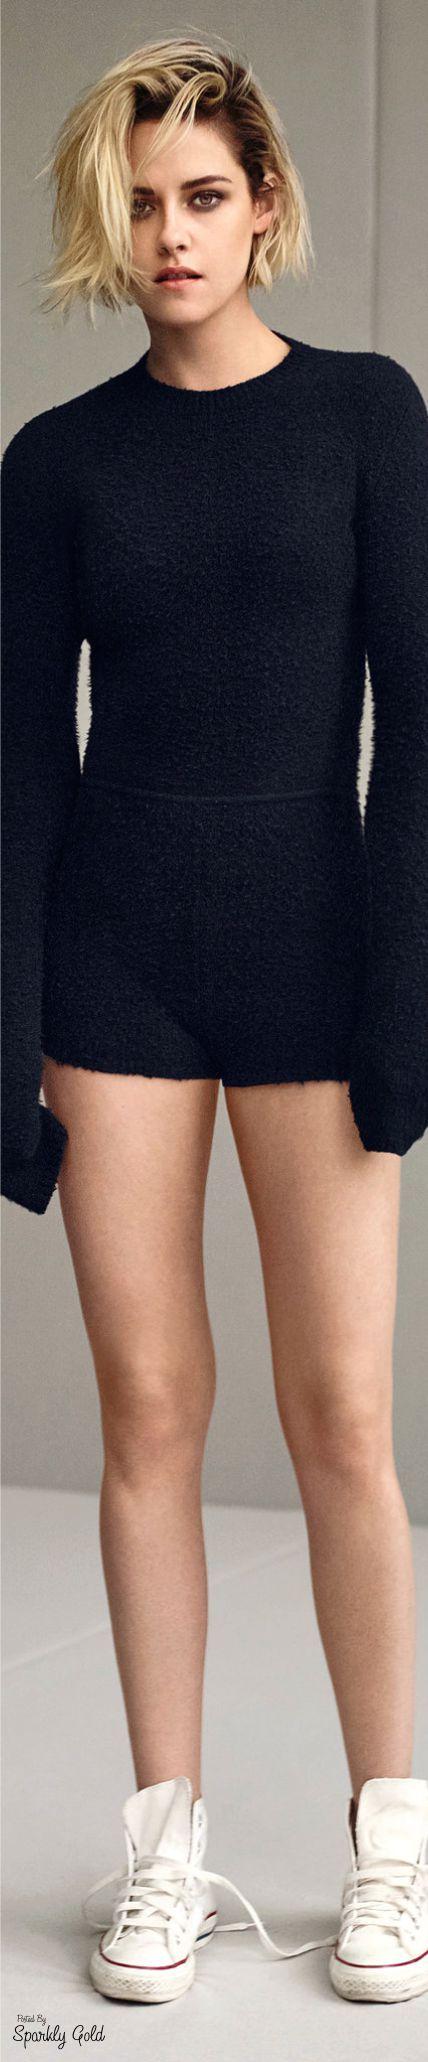 Kristen Stewart, T Magazine Aug 16. <3 Dudo de mi sexualidad con ella